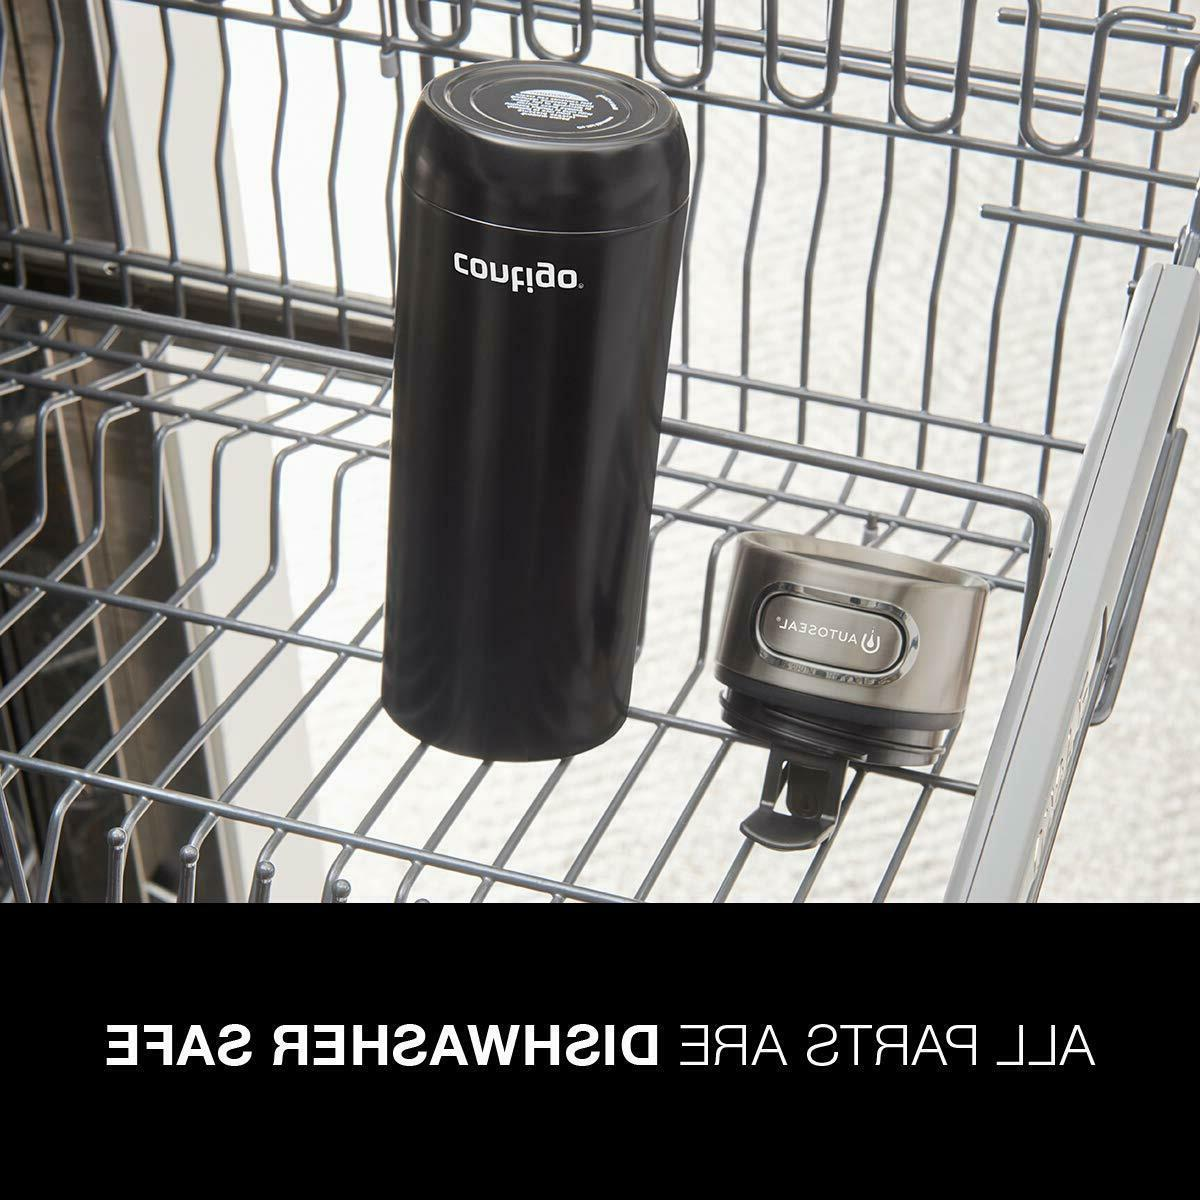 Contigo Luxe Stainl. Steel Travel Mug, oz, Bis